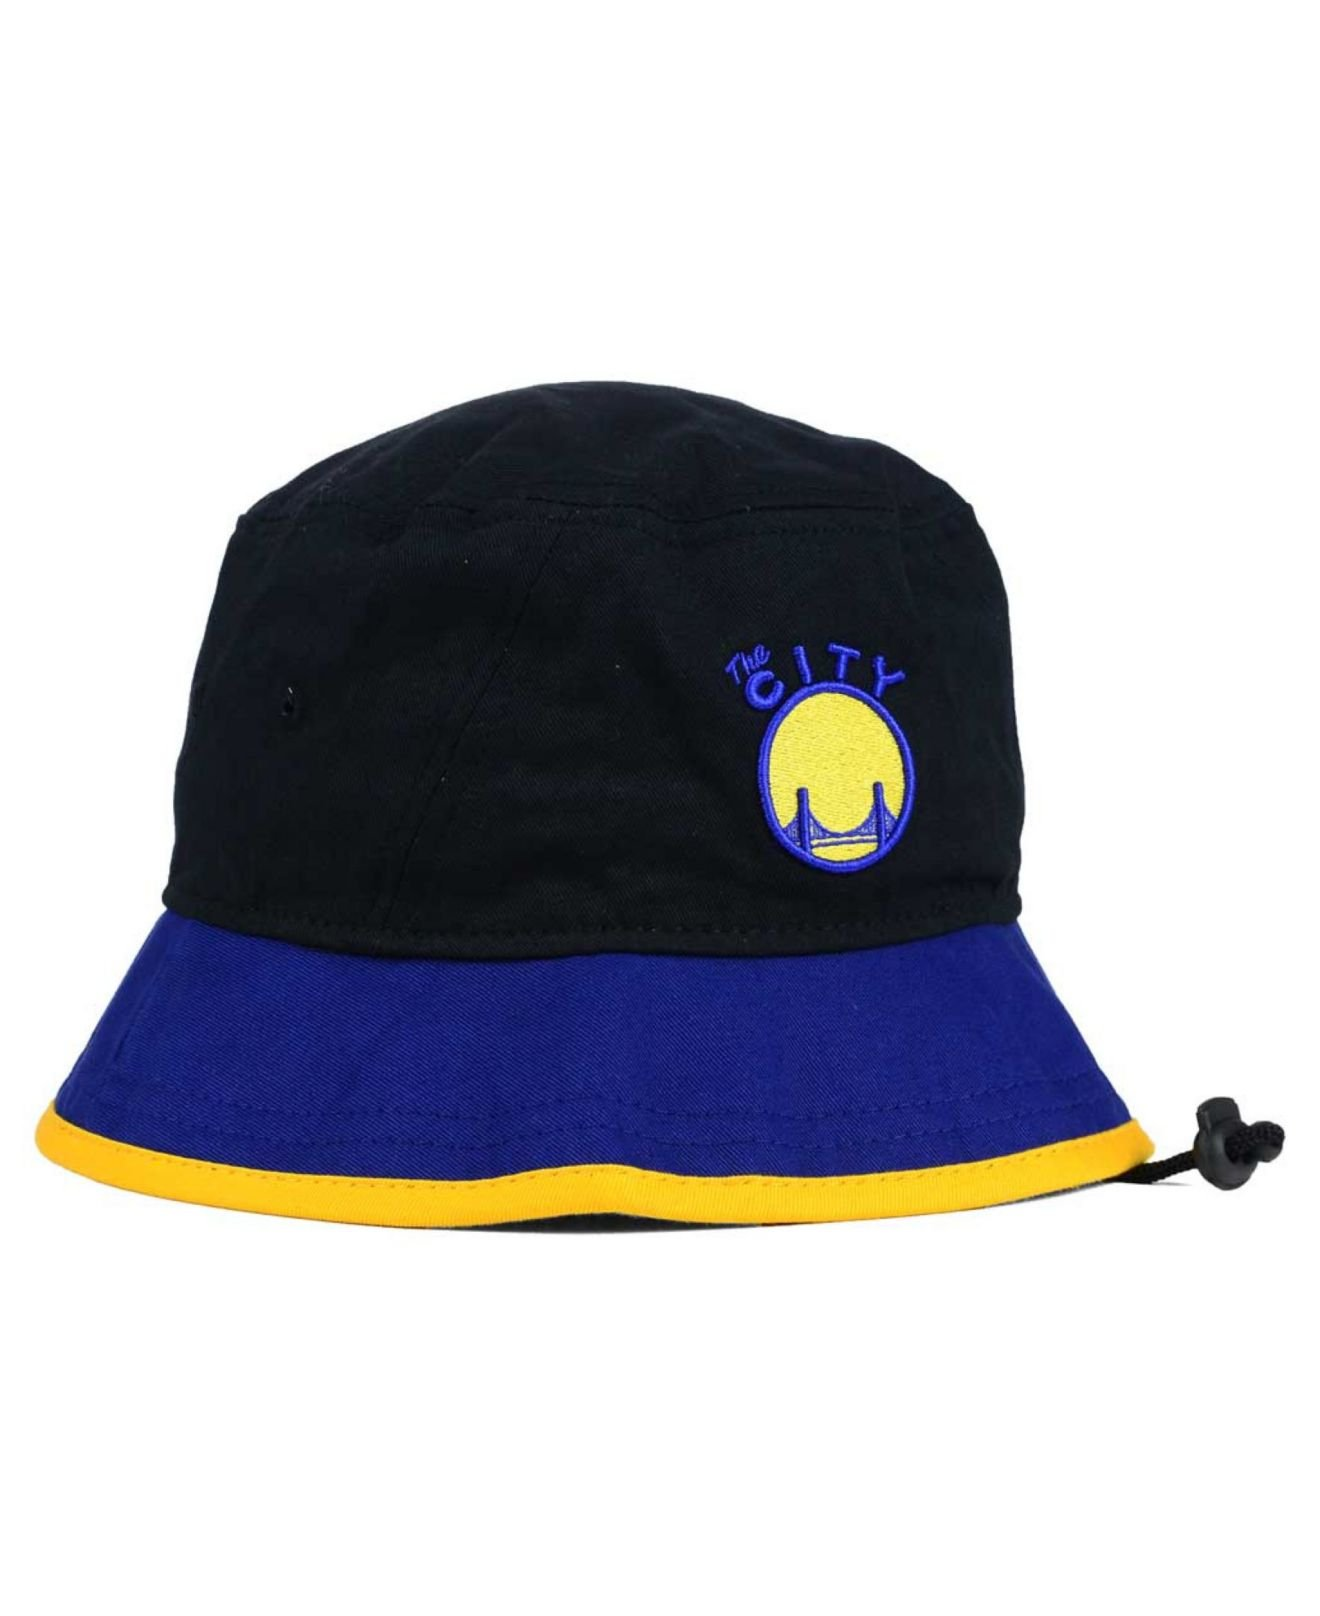 ab36910bd KTZ Blue Golden State Warriors Black-top Bucket Hat for men